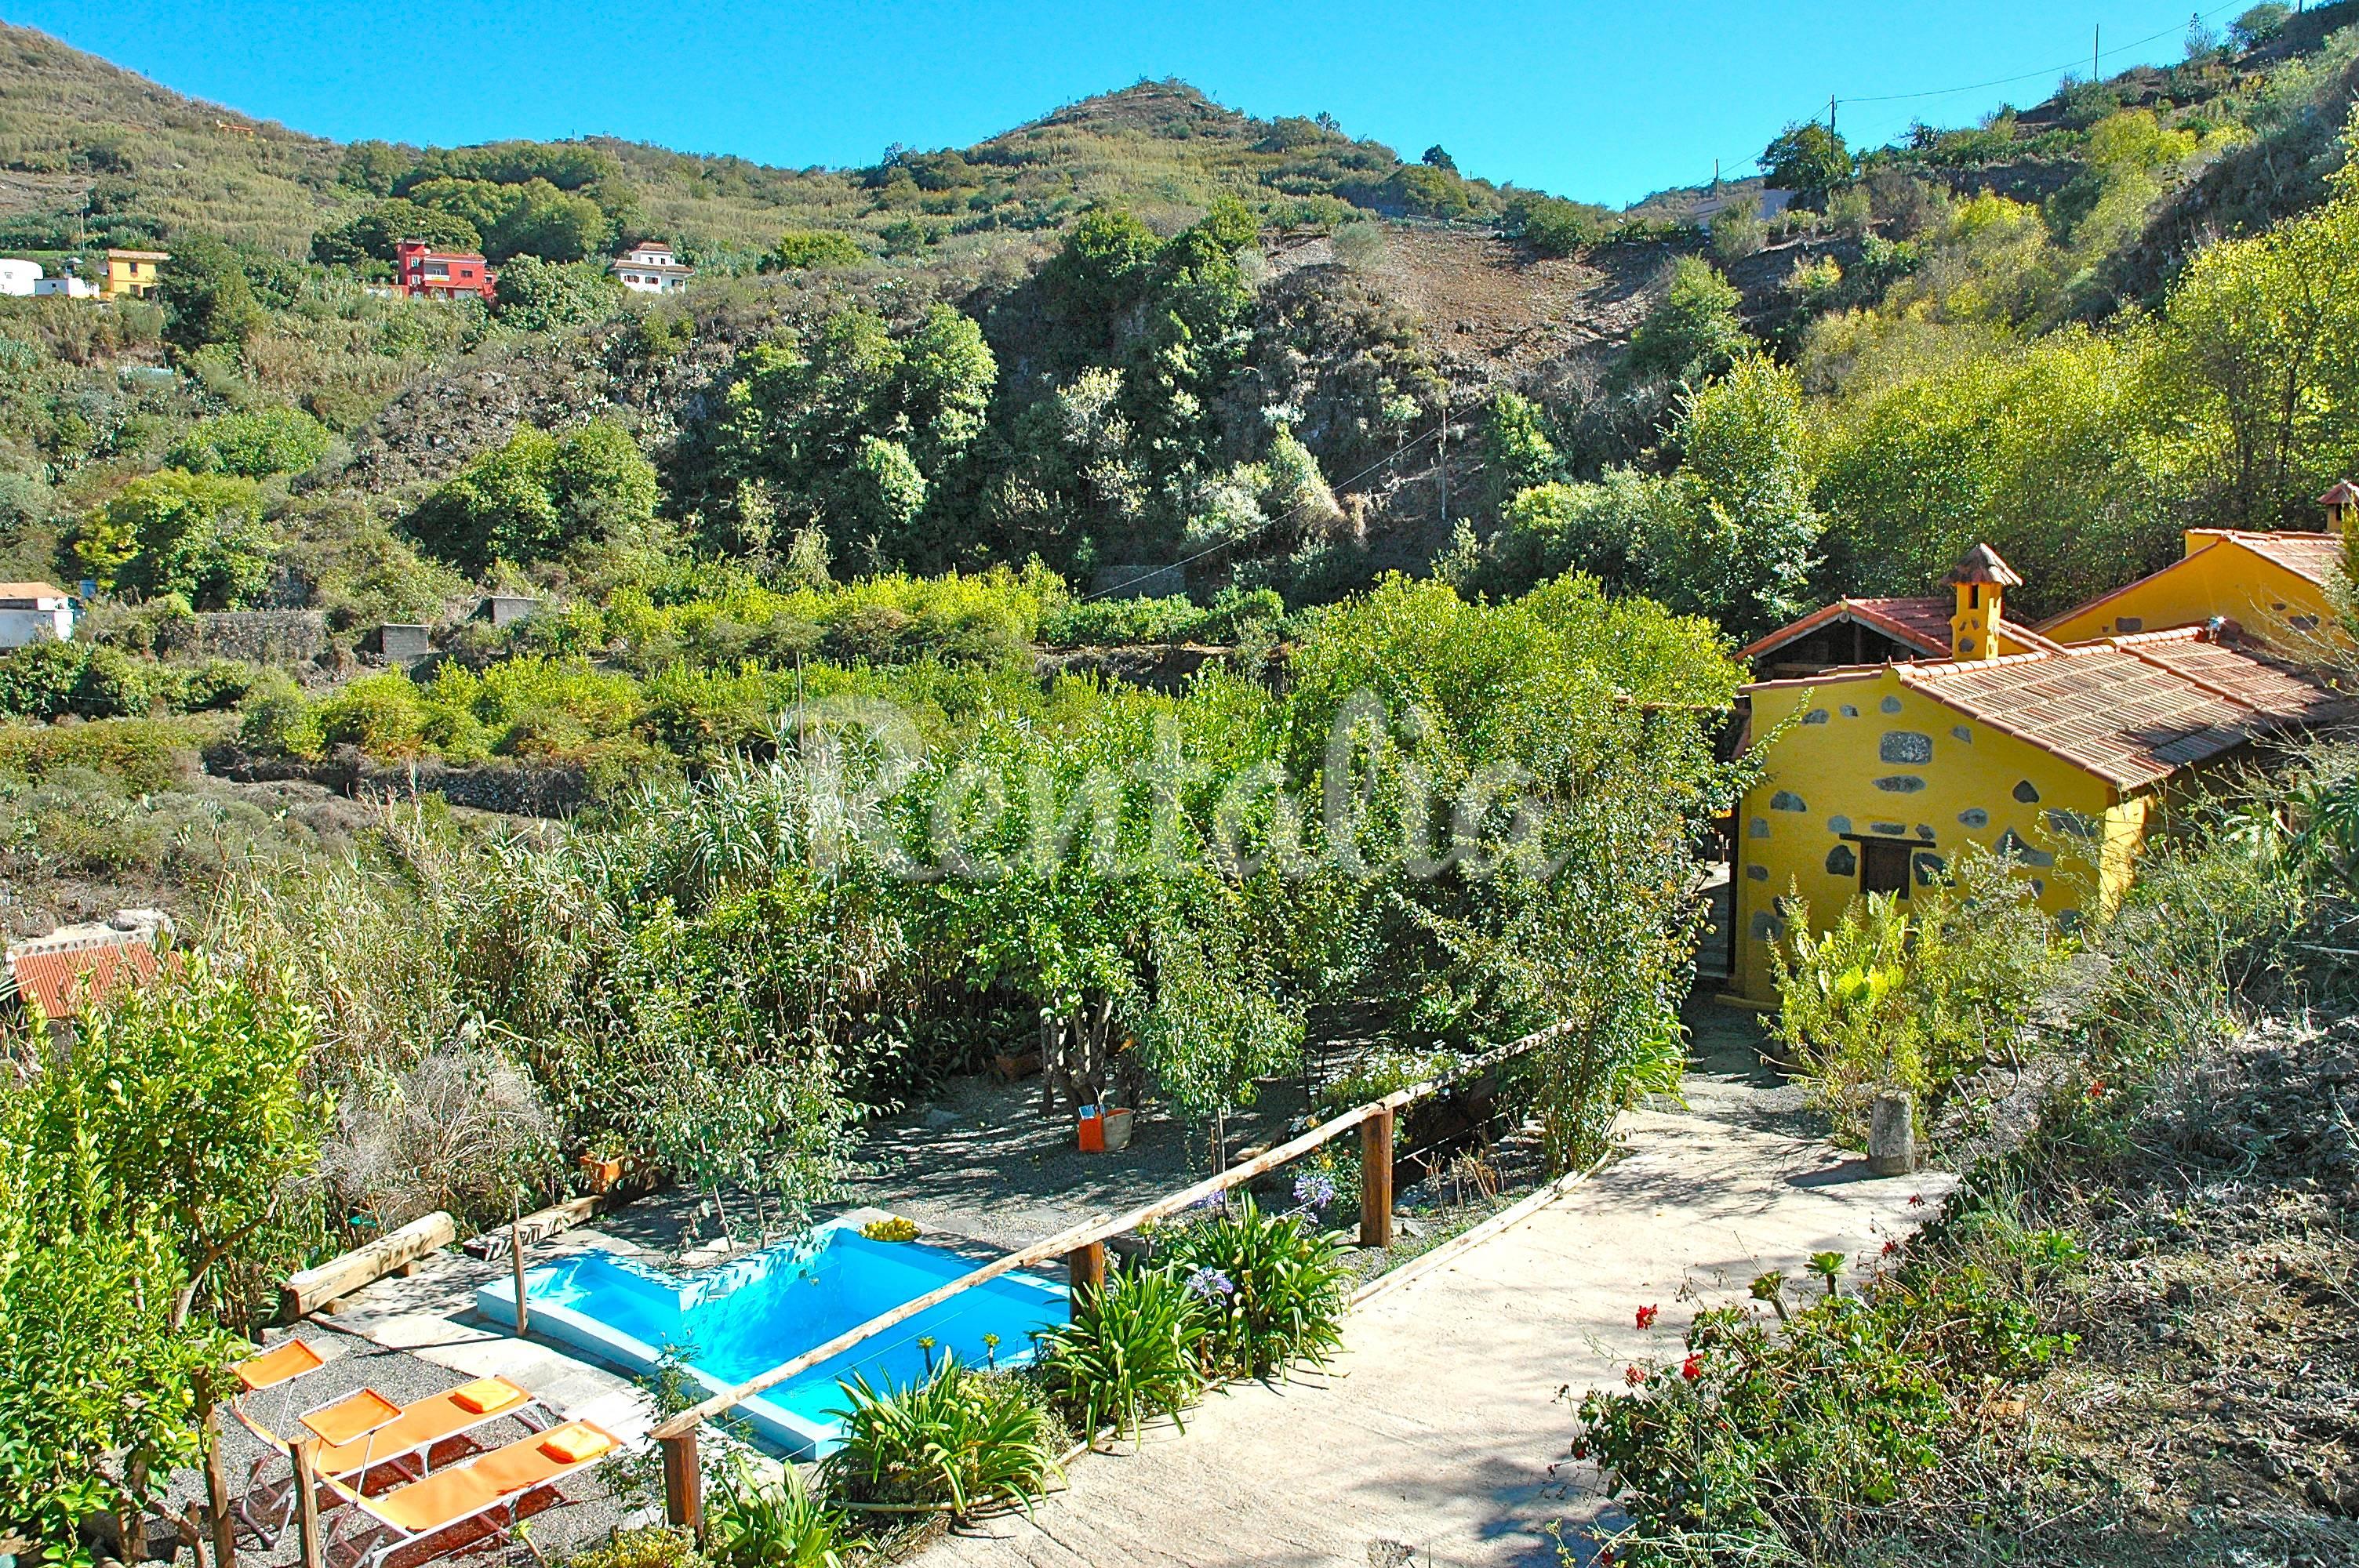 Preciosa casa de campo con piscina privada madrelagua - Villas en gran canaria con piscina ...